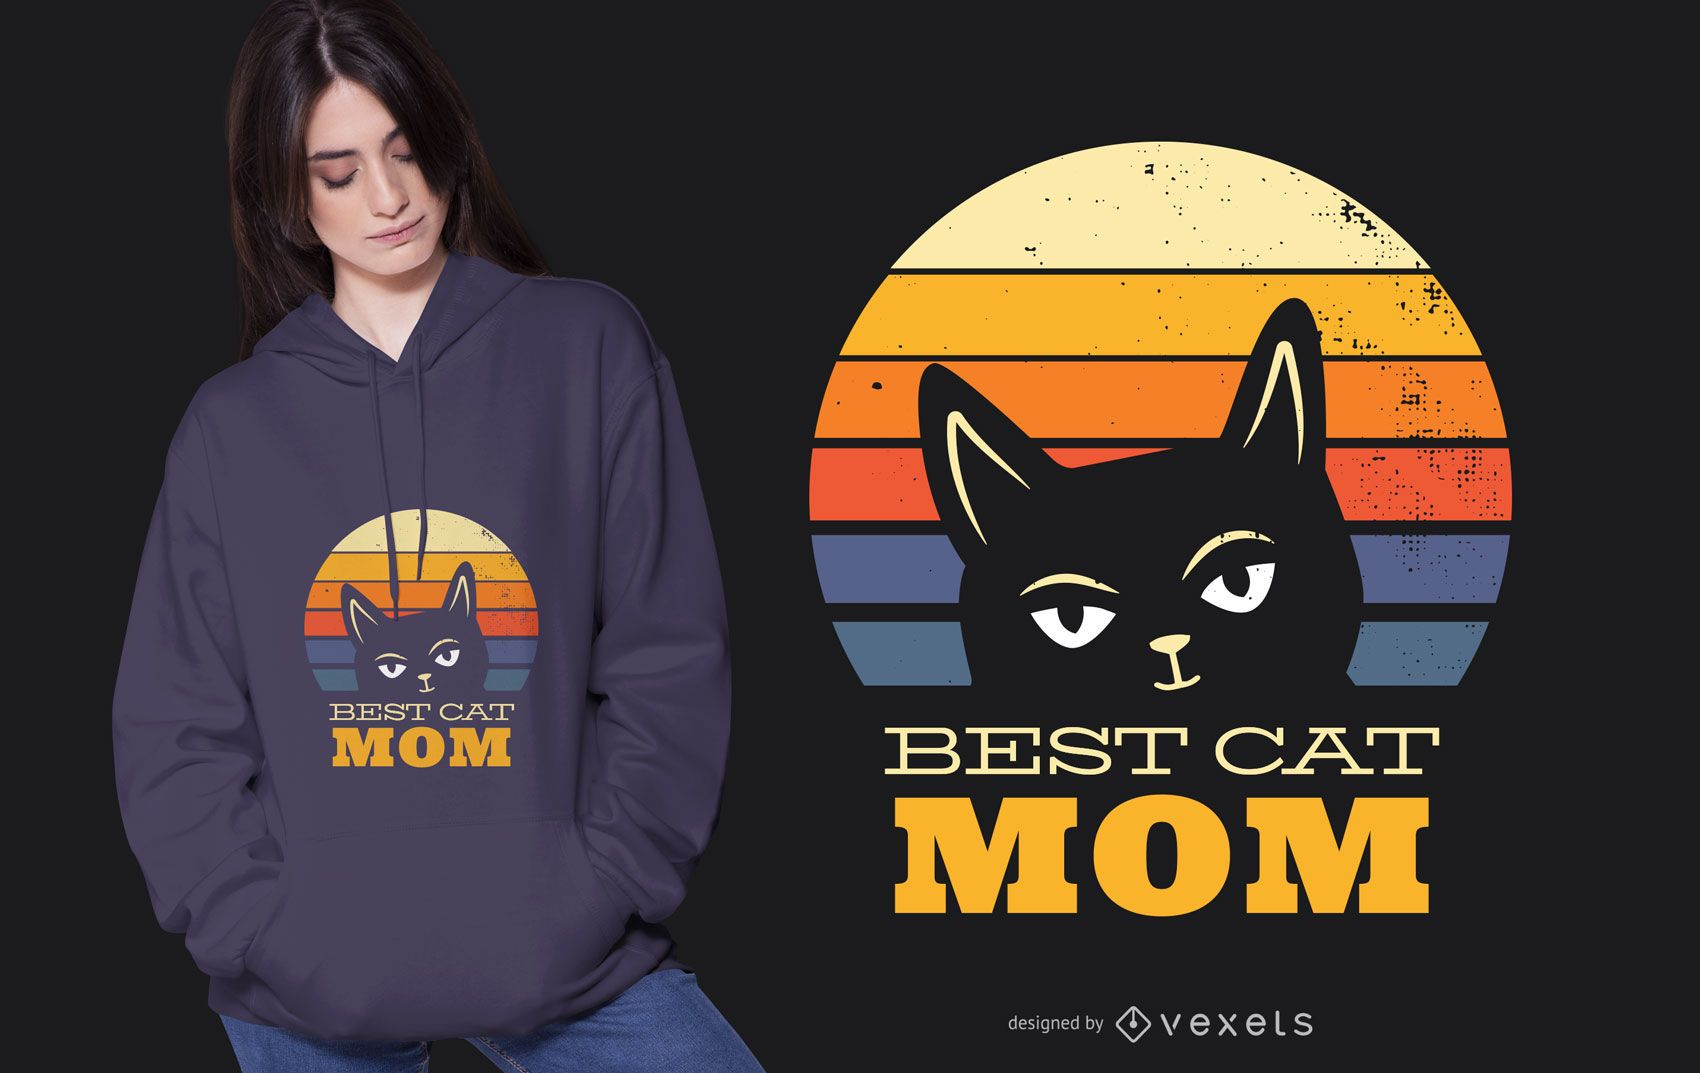 Best cat mom t-shirt design